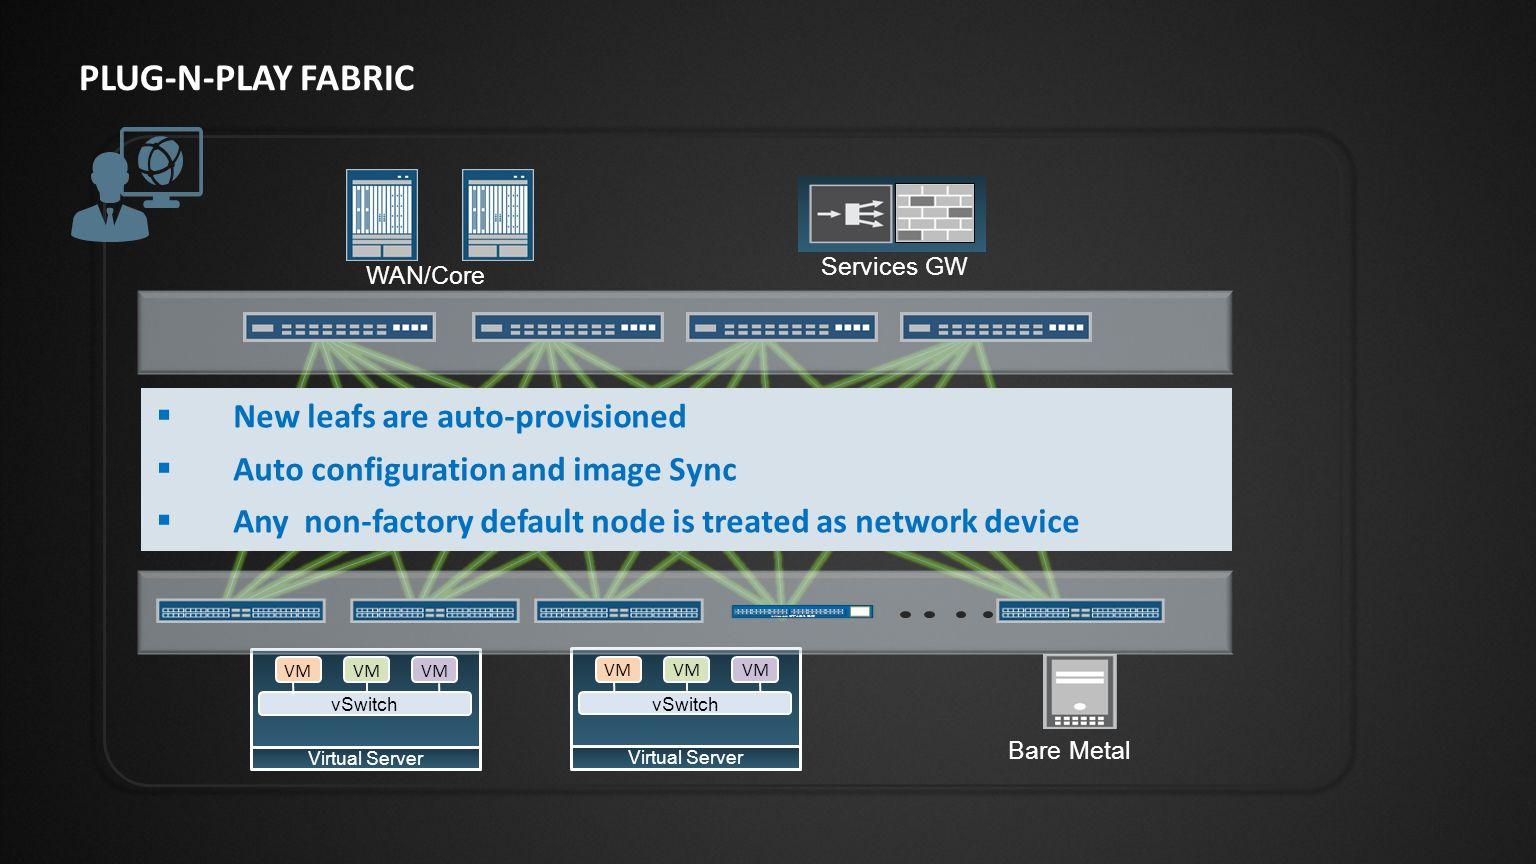 Slide Type Juniper Networks Large Venue Template / 16x9 / V6 QFX5100-24Q EX9200 Virtual Chassis Fabric (VCF) – 10G/40G QFX5100-48S EX4300 10G access Existing 1G access QFX3500 Existing 10G access VIRTUAL CHASSIS FABRIC DEPLOYMENT OPTION